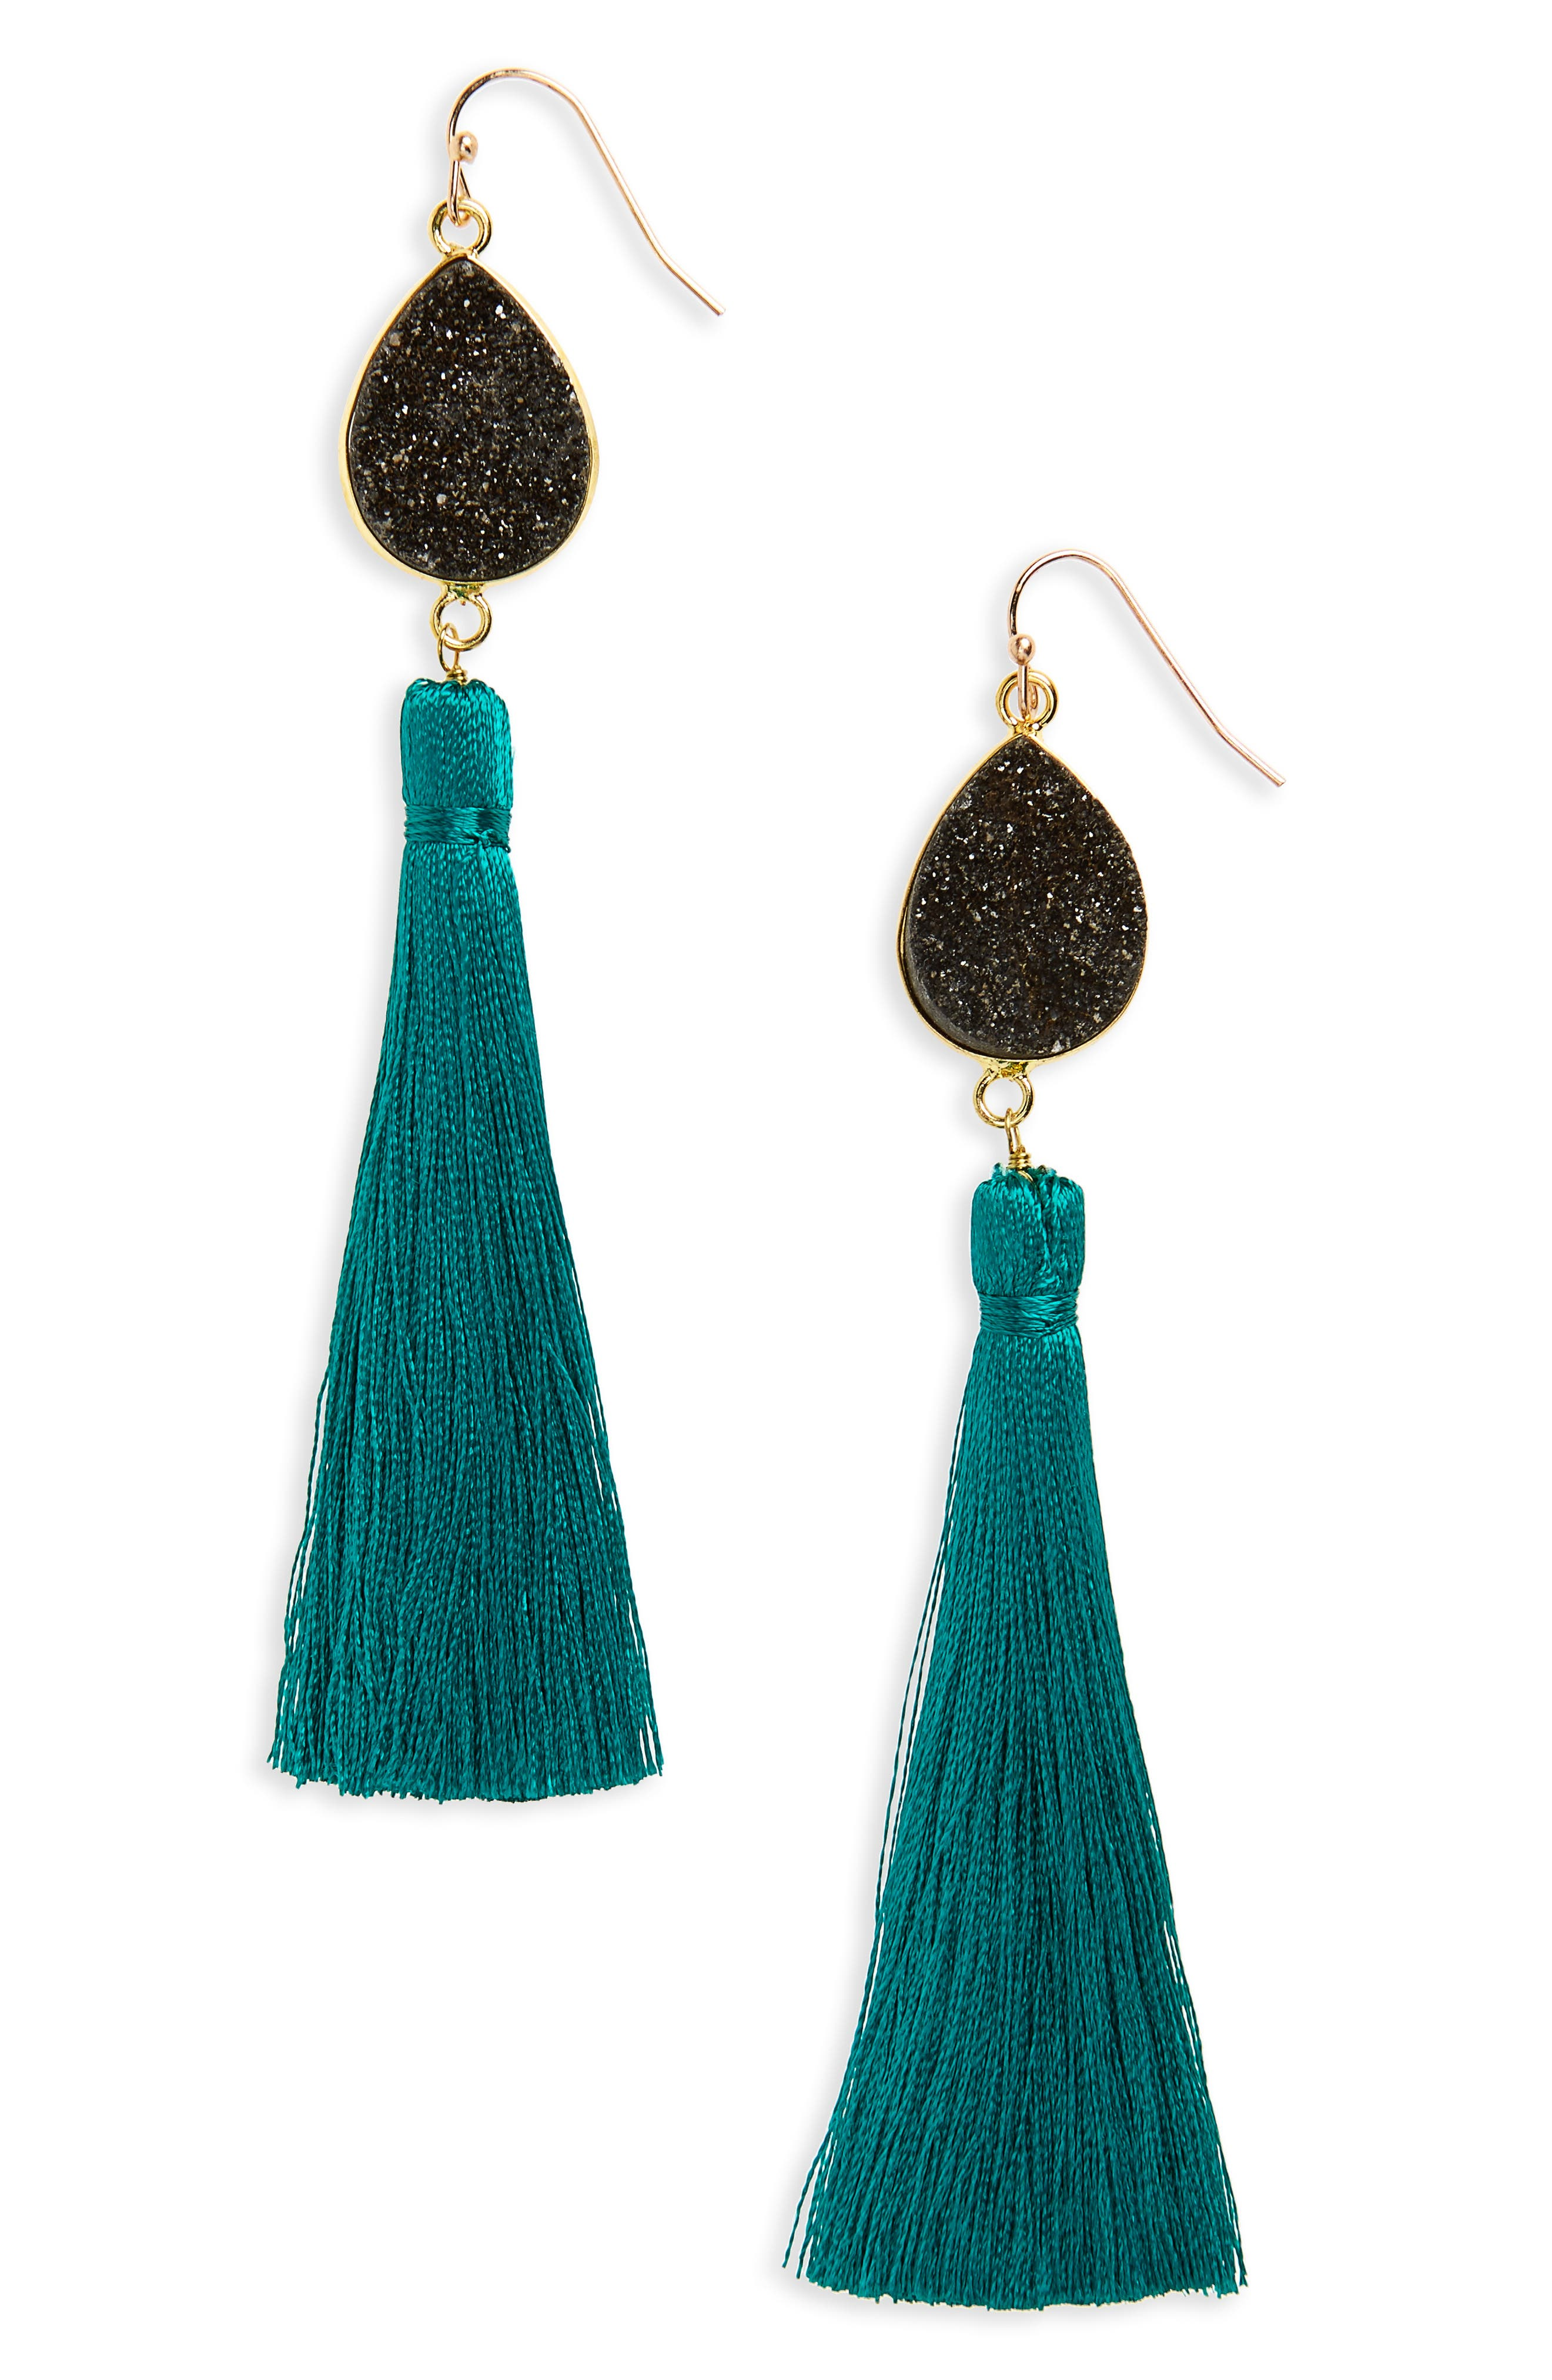 Drusy Tassel Earrings,                             Main thumbnail 1, color,                             001